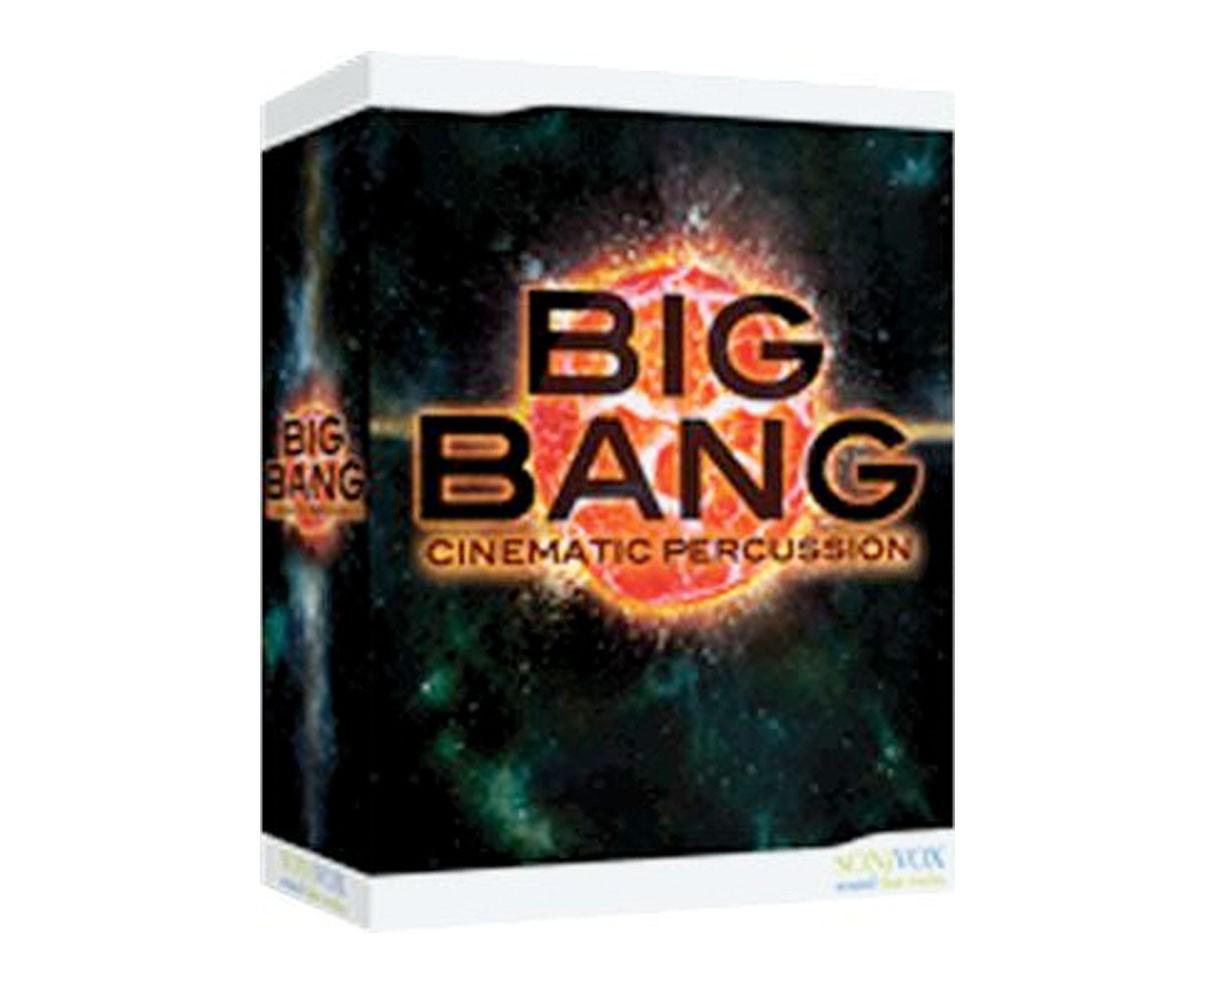 SONiVOX Big Bang - Cinematic Percussion